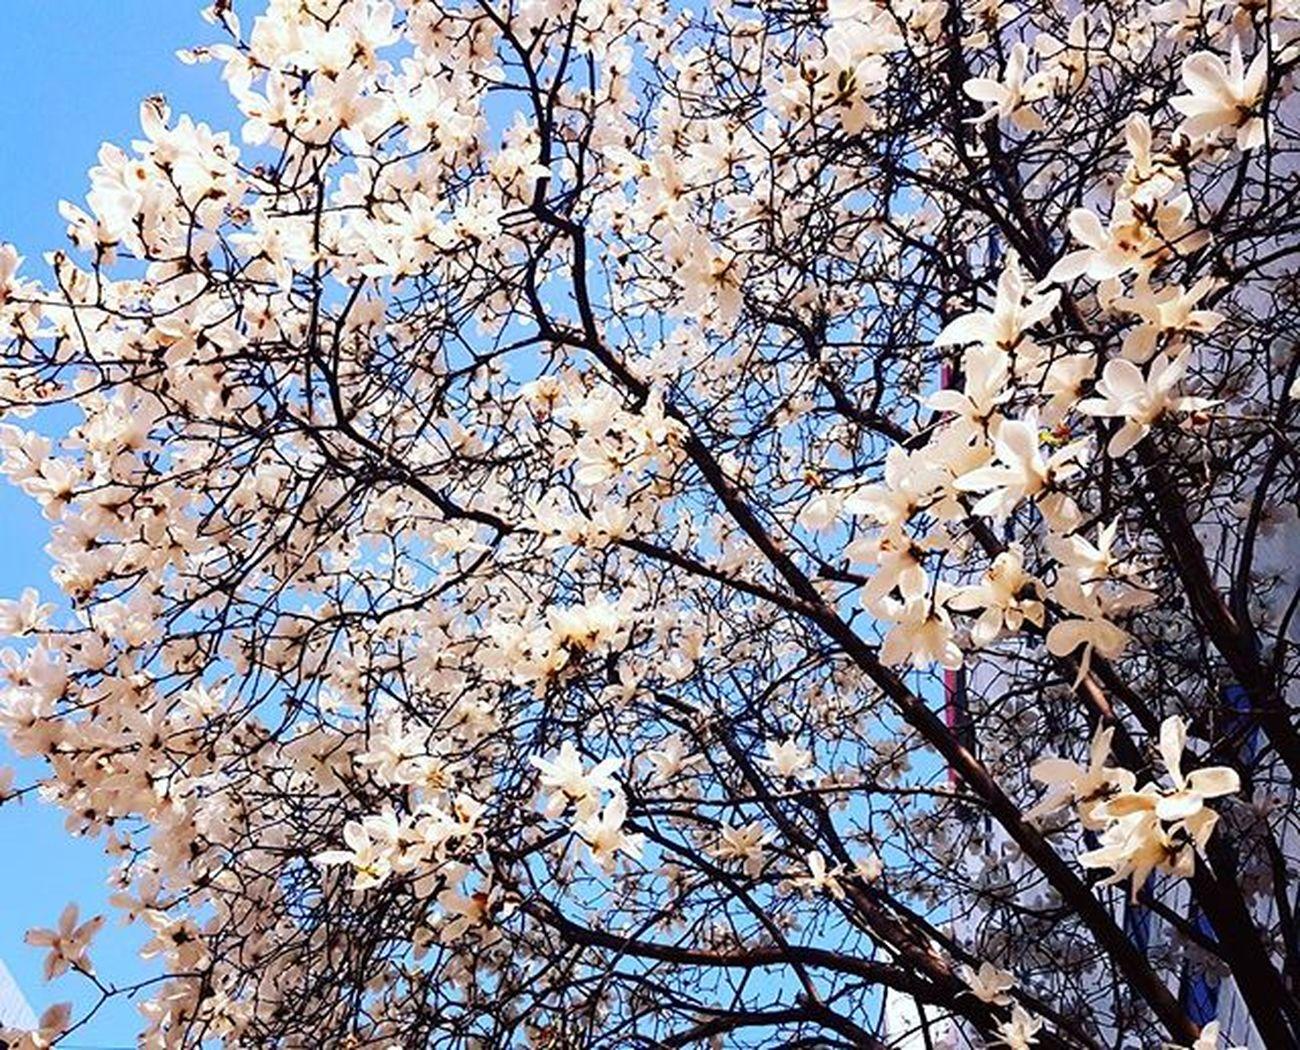 Photography Photographer 부산 Busan Spring Flower 일상 데일리 감성 감성사진 사진 여행 일상공유 Sotong 미러리스카메라 Follow Followme Photo Travel Daily Southkorea